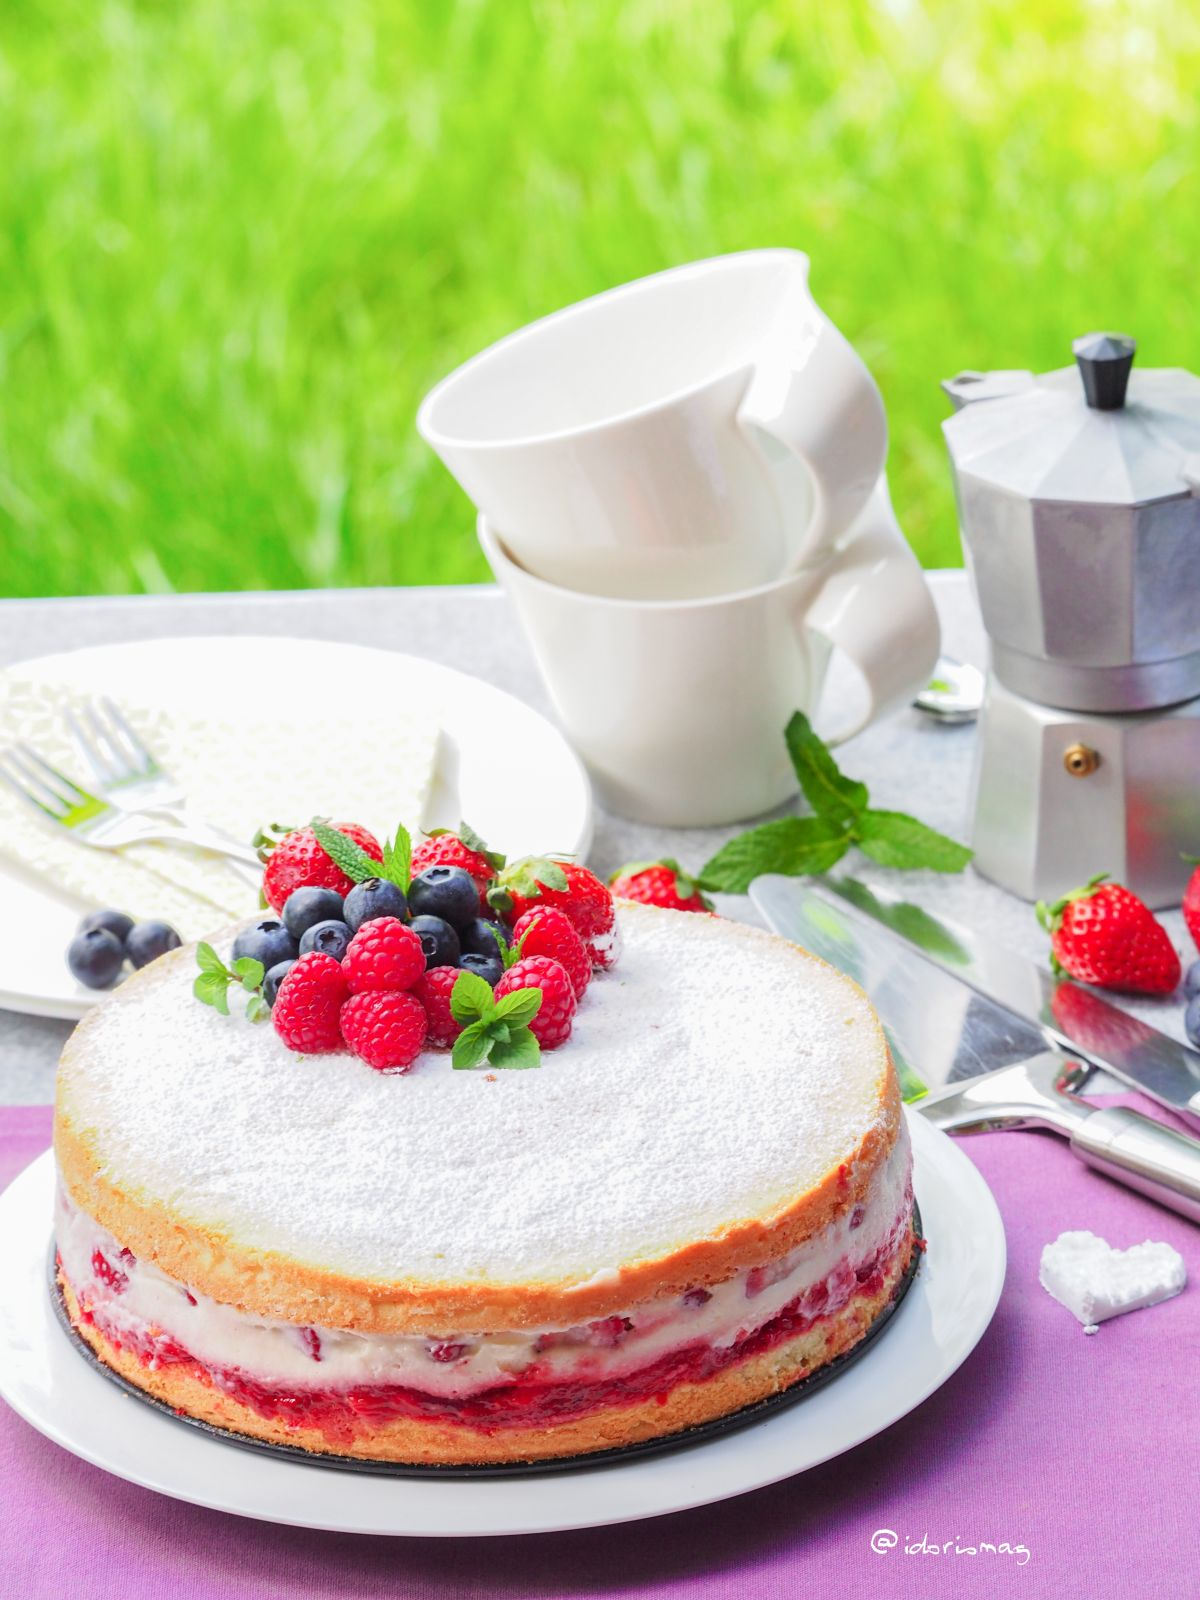 Erdbeer Torte mit luftigem Biskuit Teig vegan